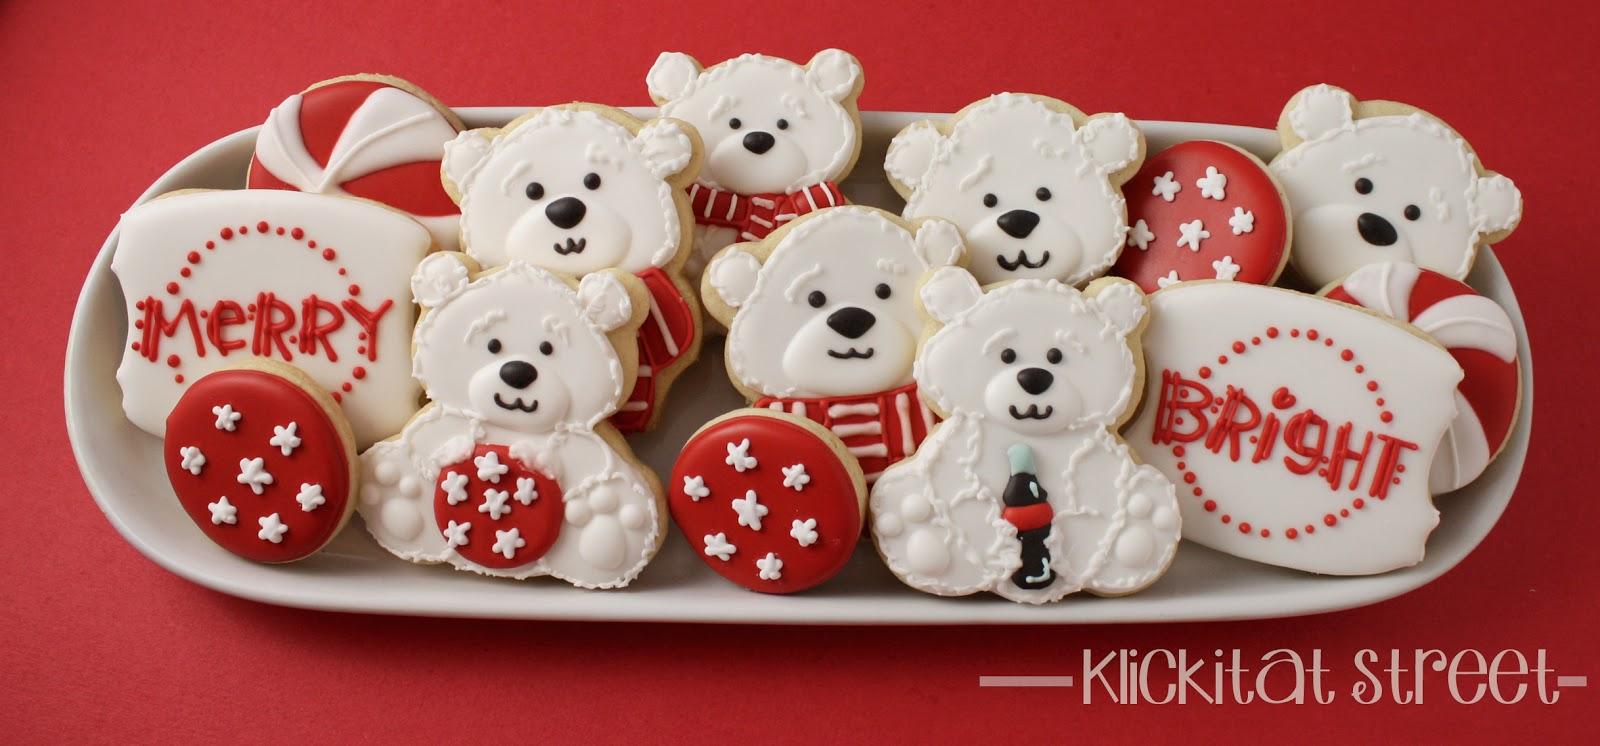 KlickitatStreet Coca Cola Polar Bears Cookie Platter